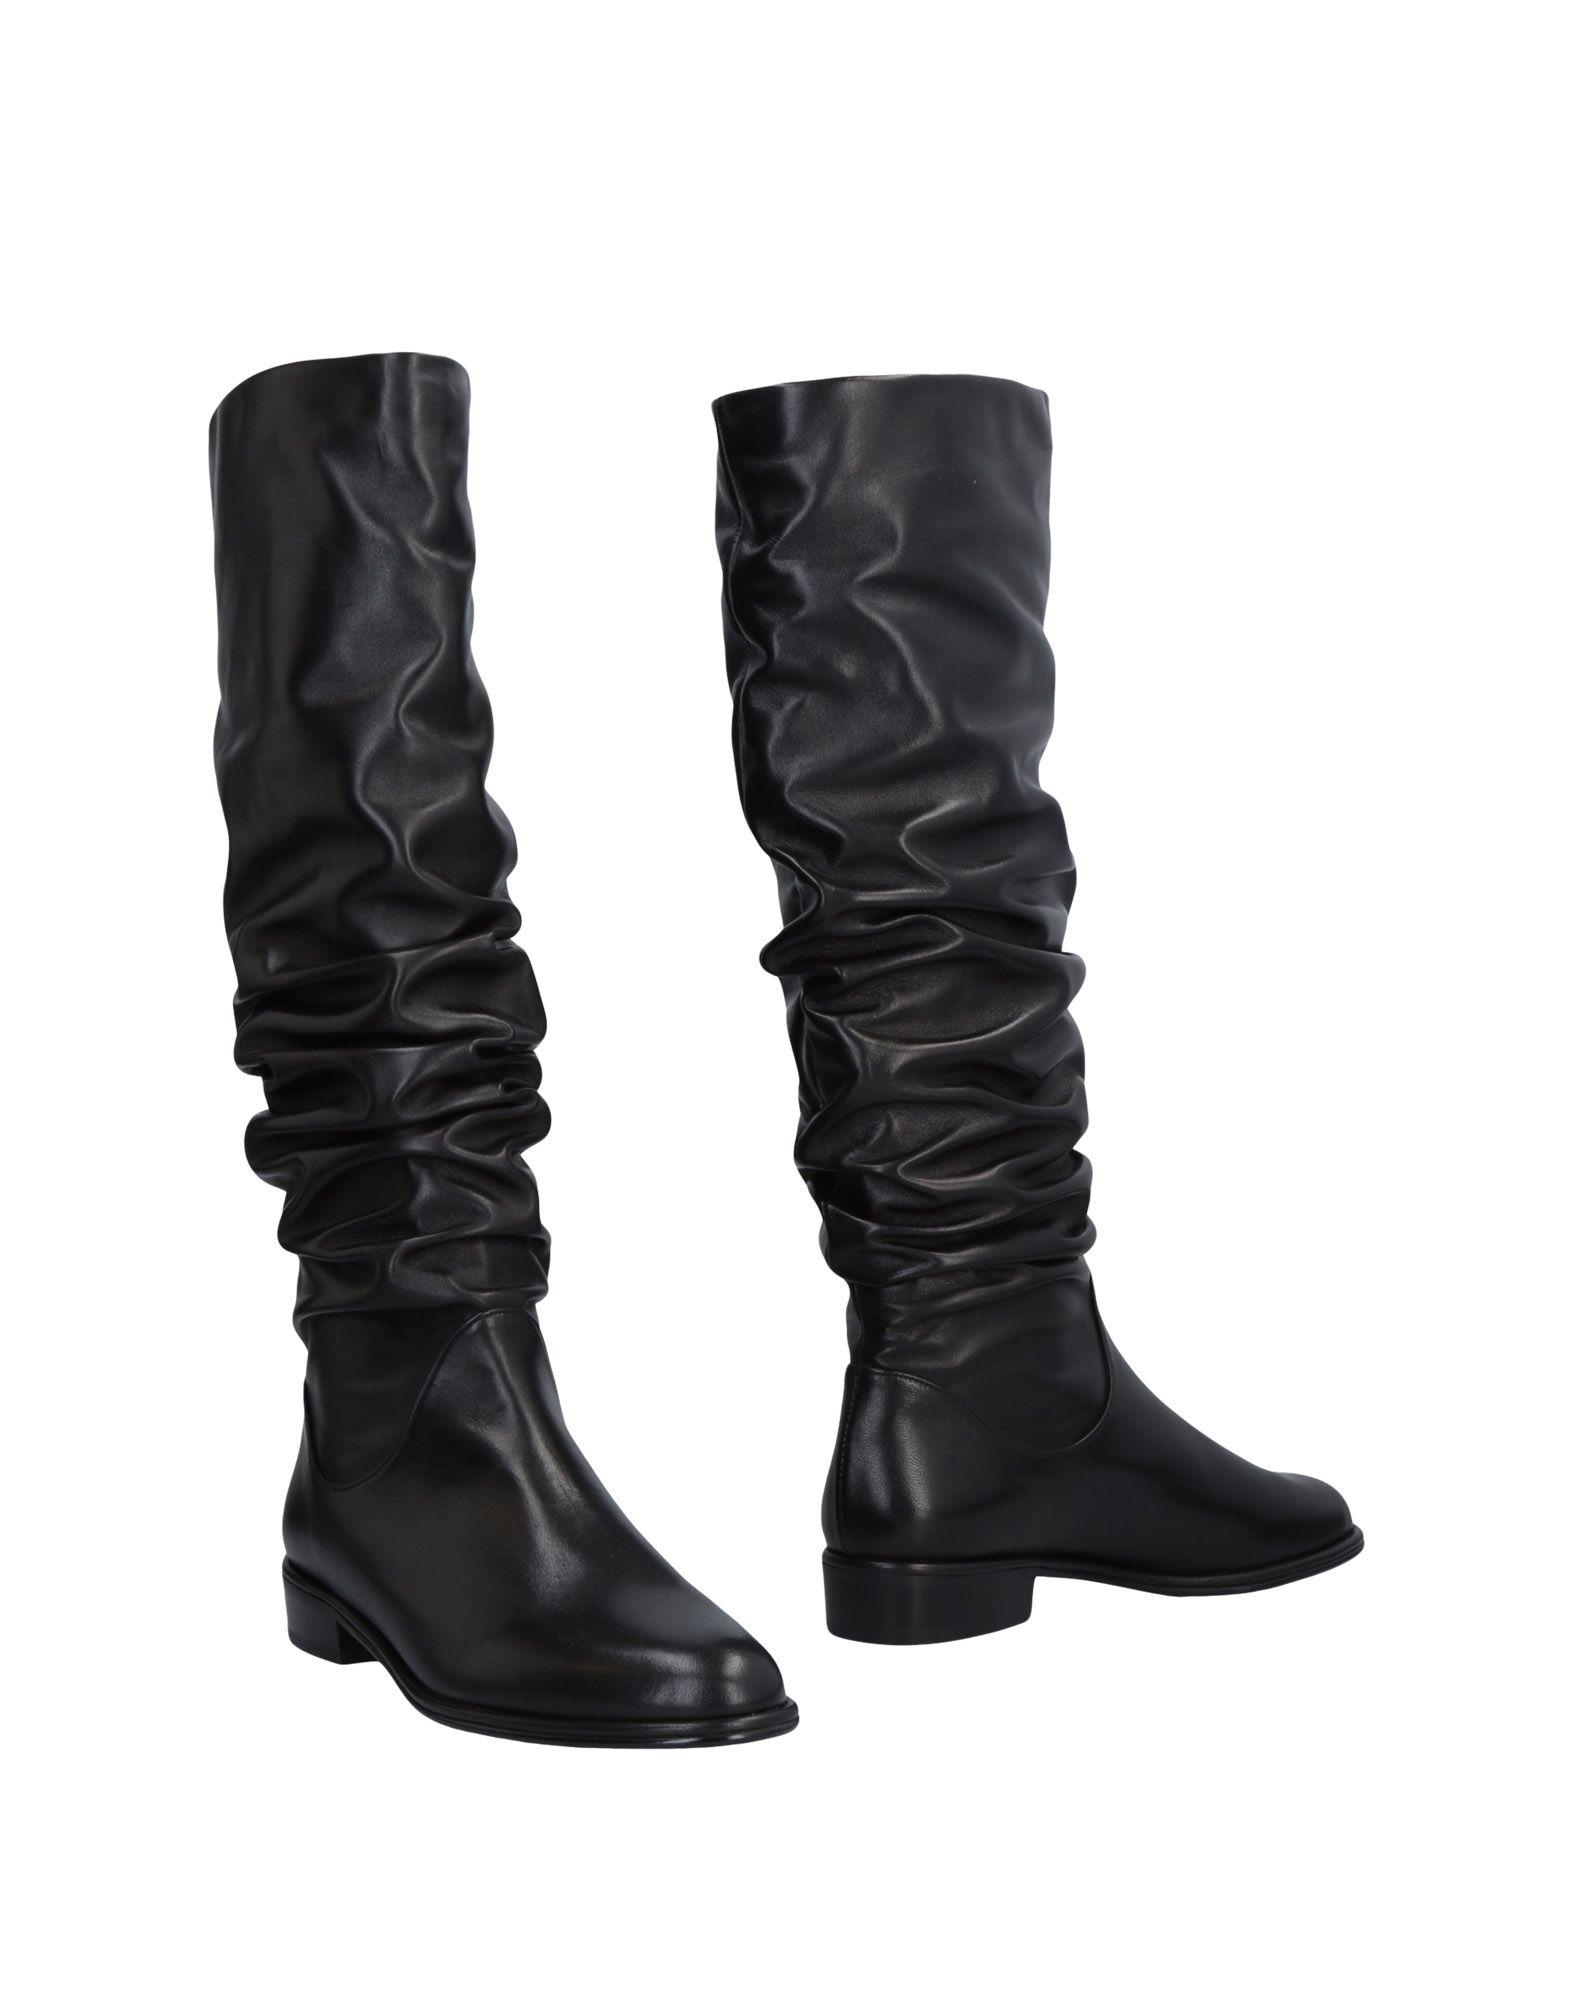 Stuart Weitzman Stiefel Damen Schuhe  11459406ASGünstige gut aussehende Schuhe Damen e22c6b